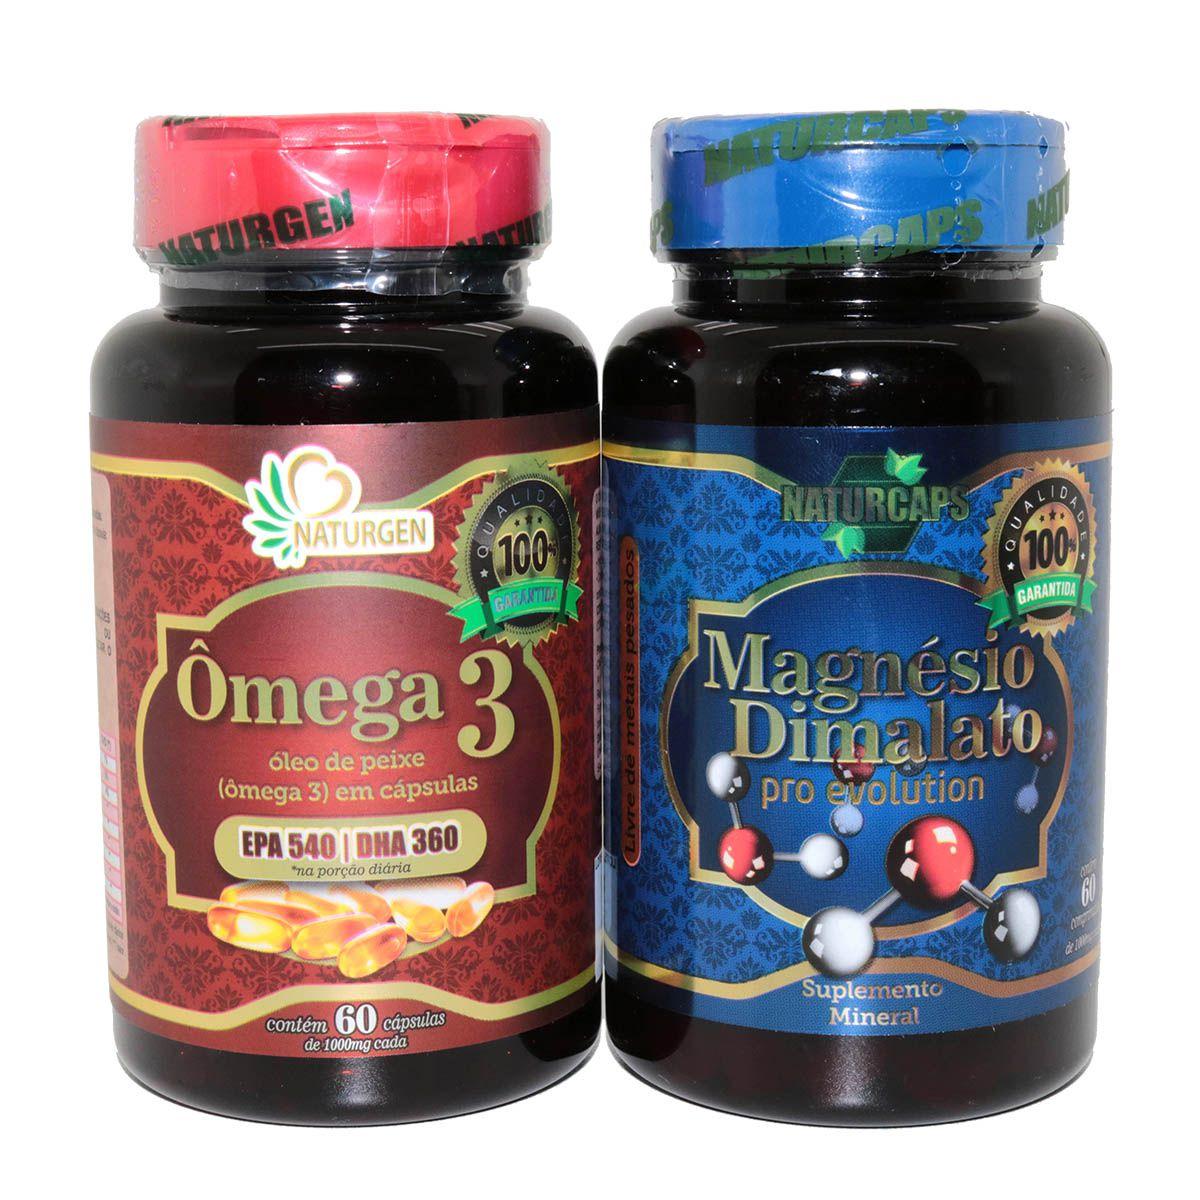 Magnesio Dimalato Pro Evolution 1000mg + Omega 3 Naturcaps